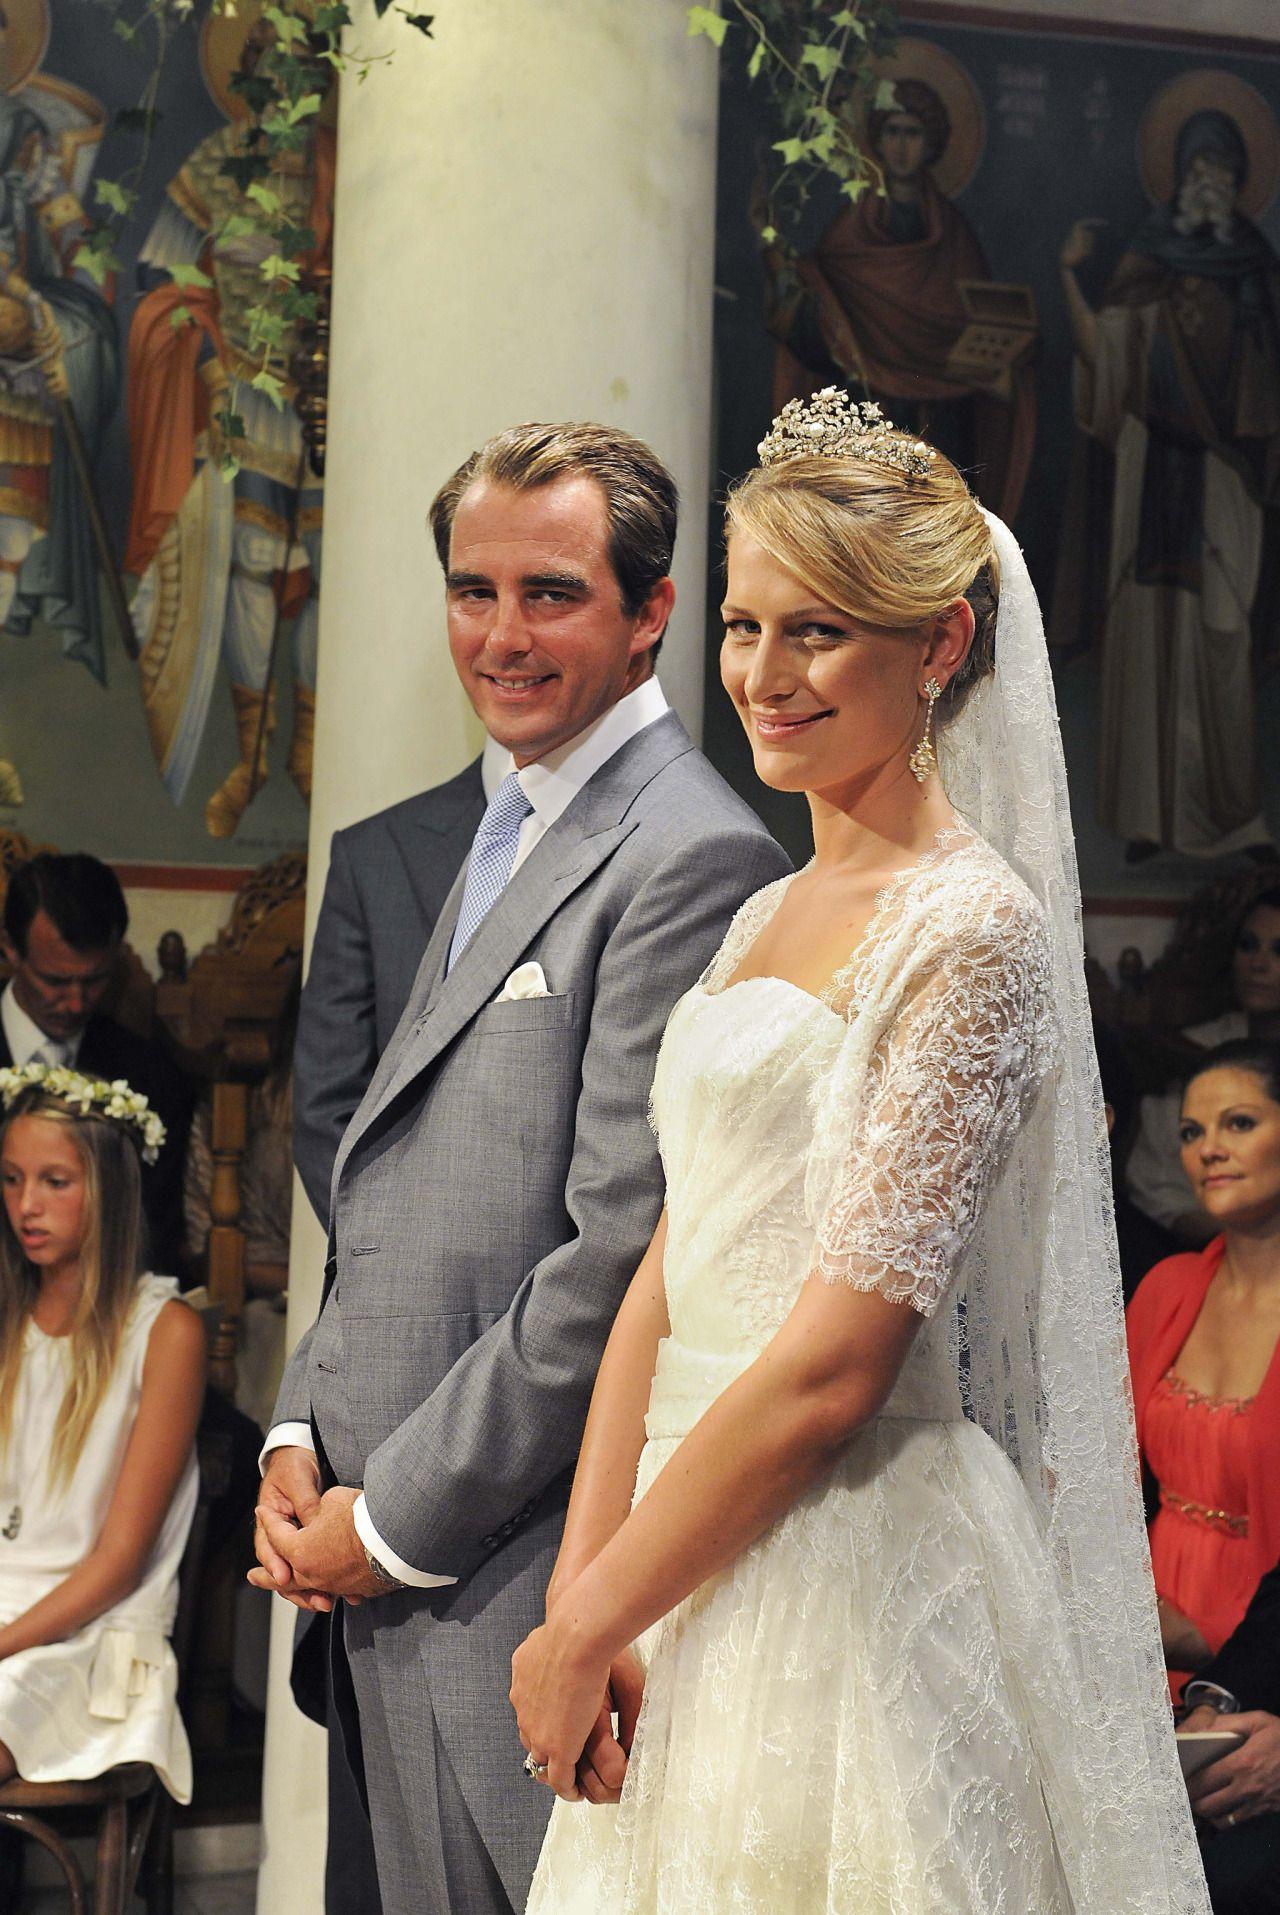 Wedding Of Prince Nikolaos Of Greece And Tatiana Blatnick Spetses Greece 25 August 2010 Royal Wedding Gowns Royal Weddings Royal Brides [ 1915 x 1280 Pixel ]